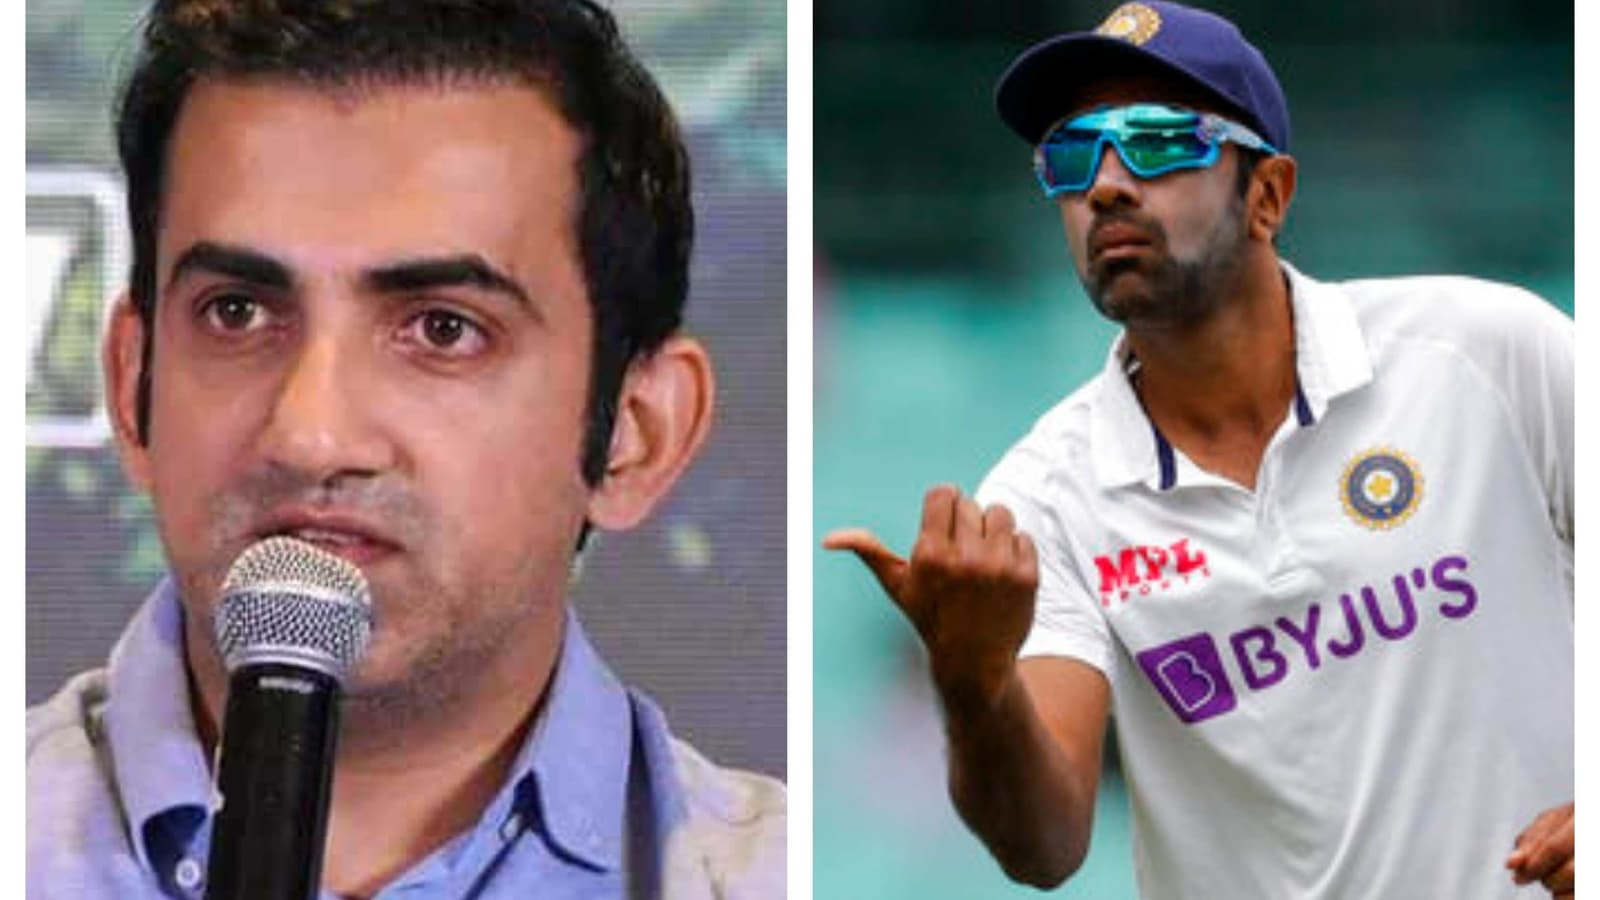 'He is just a class act,' Gautam Gambhir says R Ashwin not being part of white-ball cricket is 'very unfortunate' - Hindustan Times